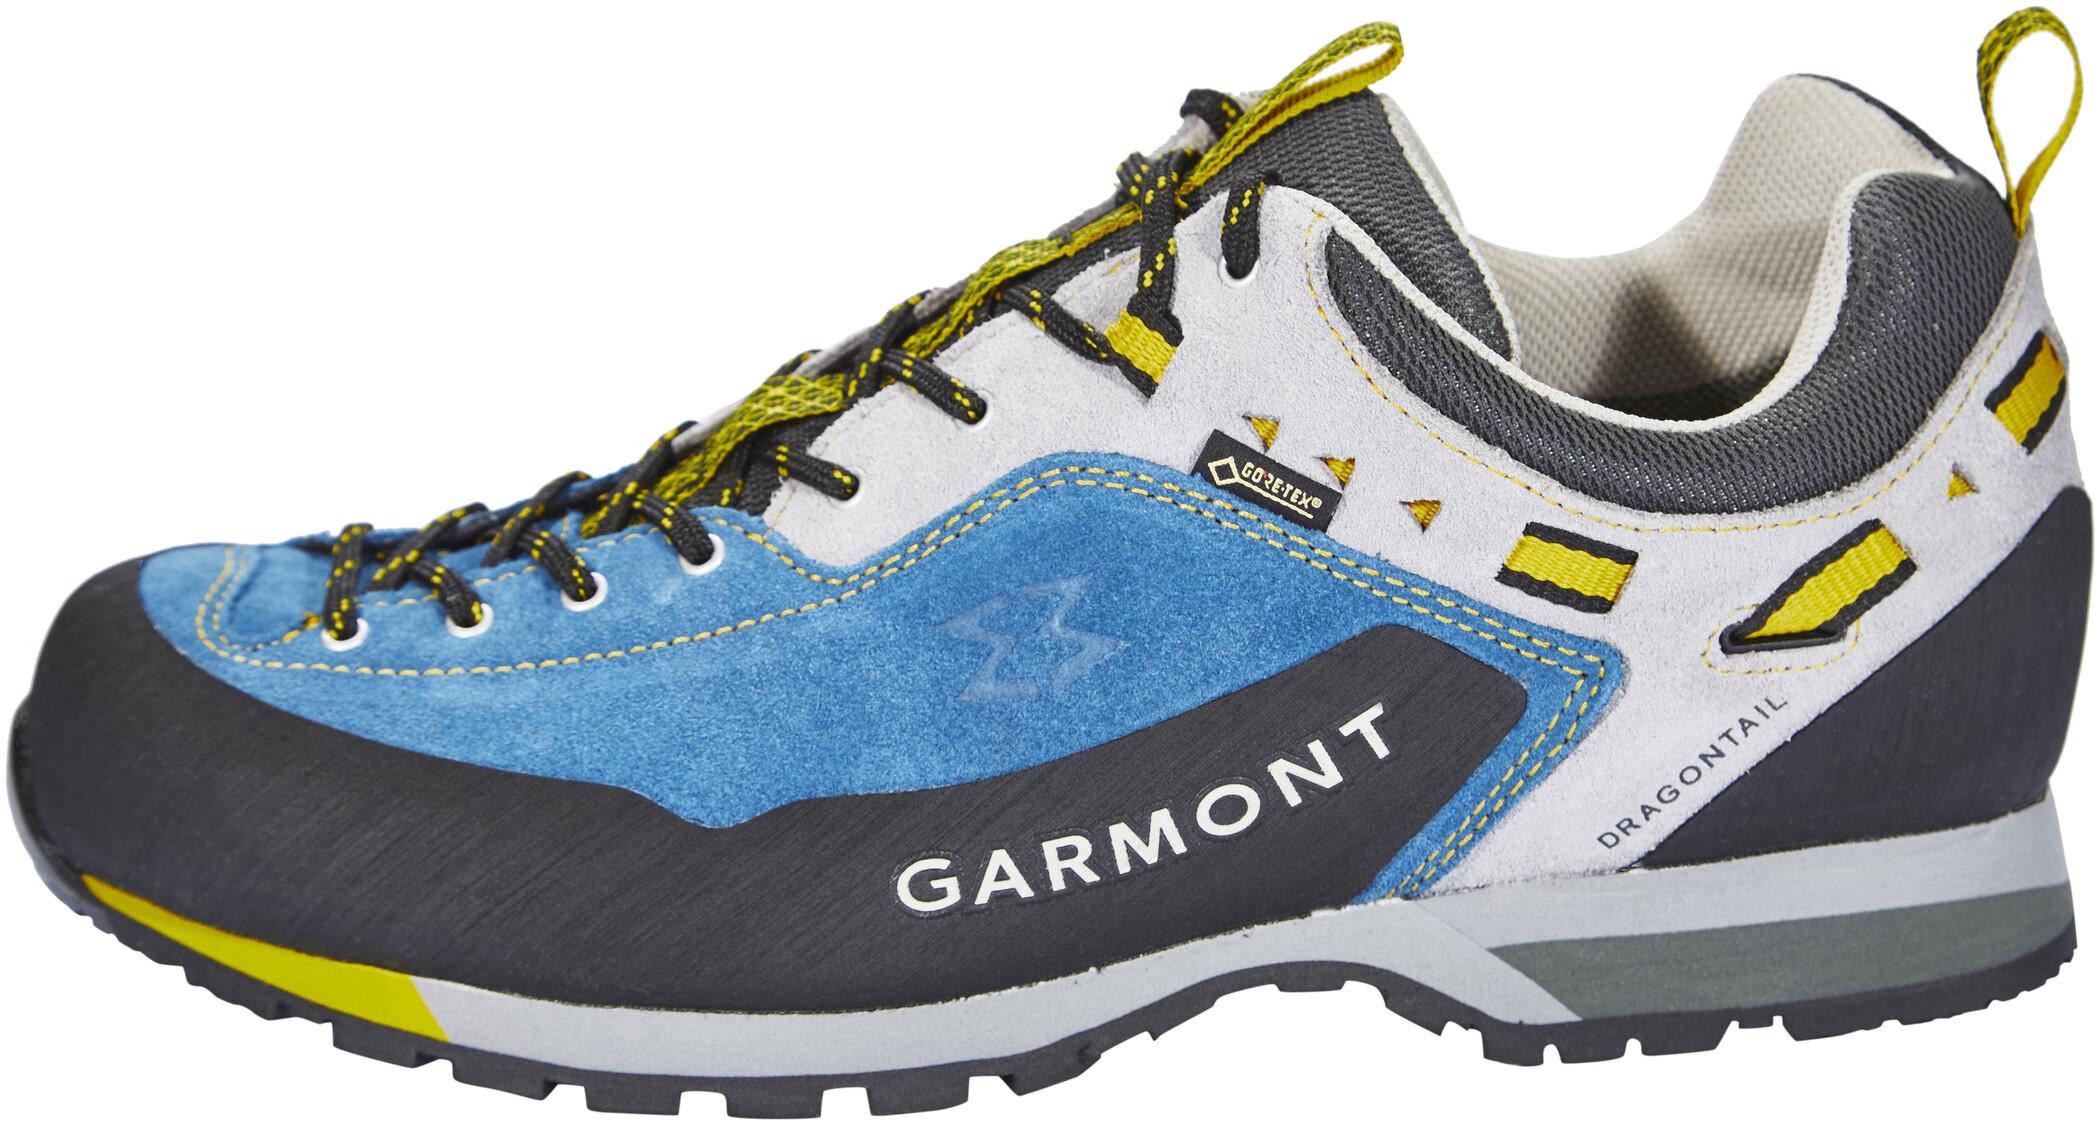 Garmont Dragontail LT GTX Schuhe Herren night bluelight grey